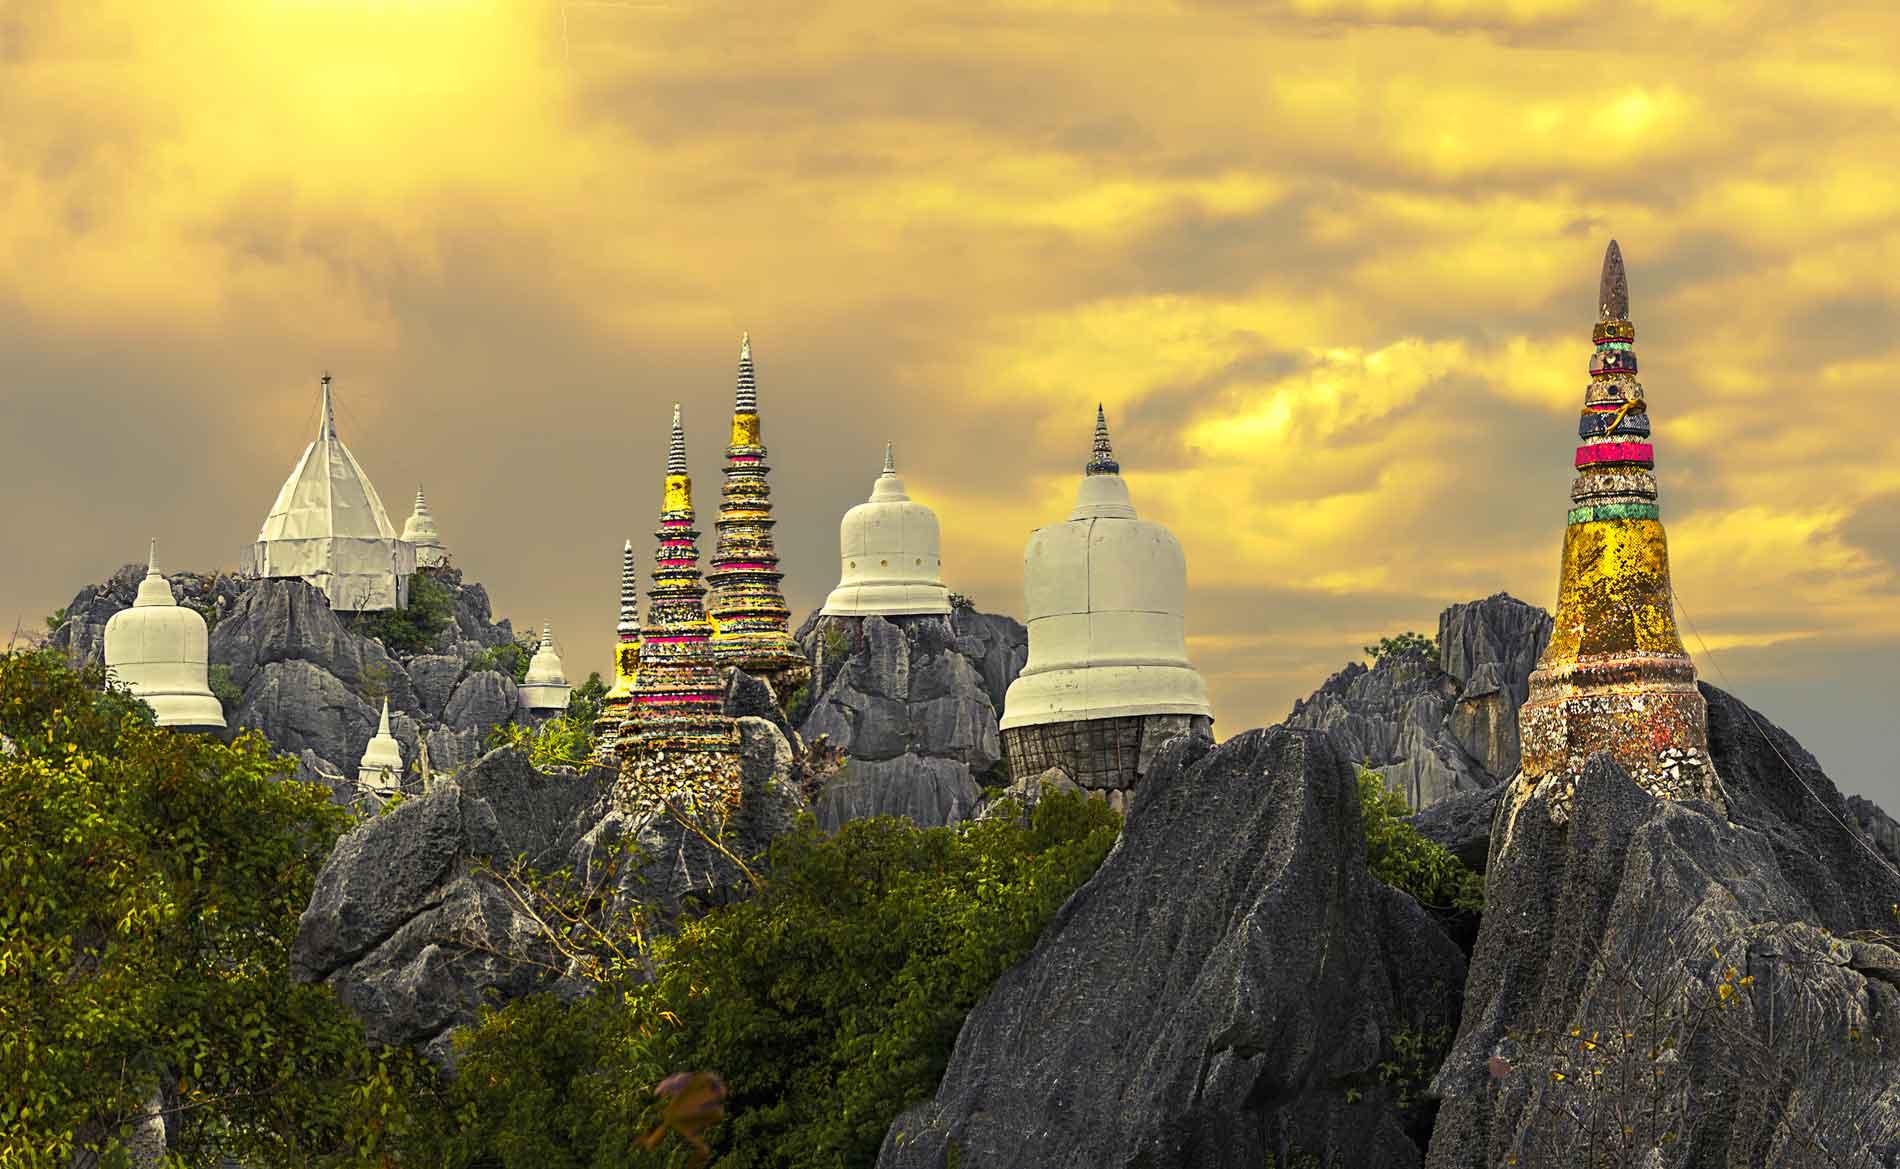 Ngôi đền Chalermprakiat trên đỉnh Pu Yak